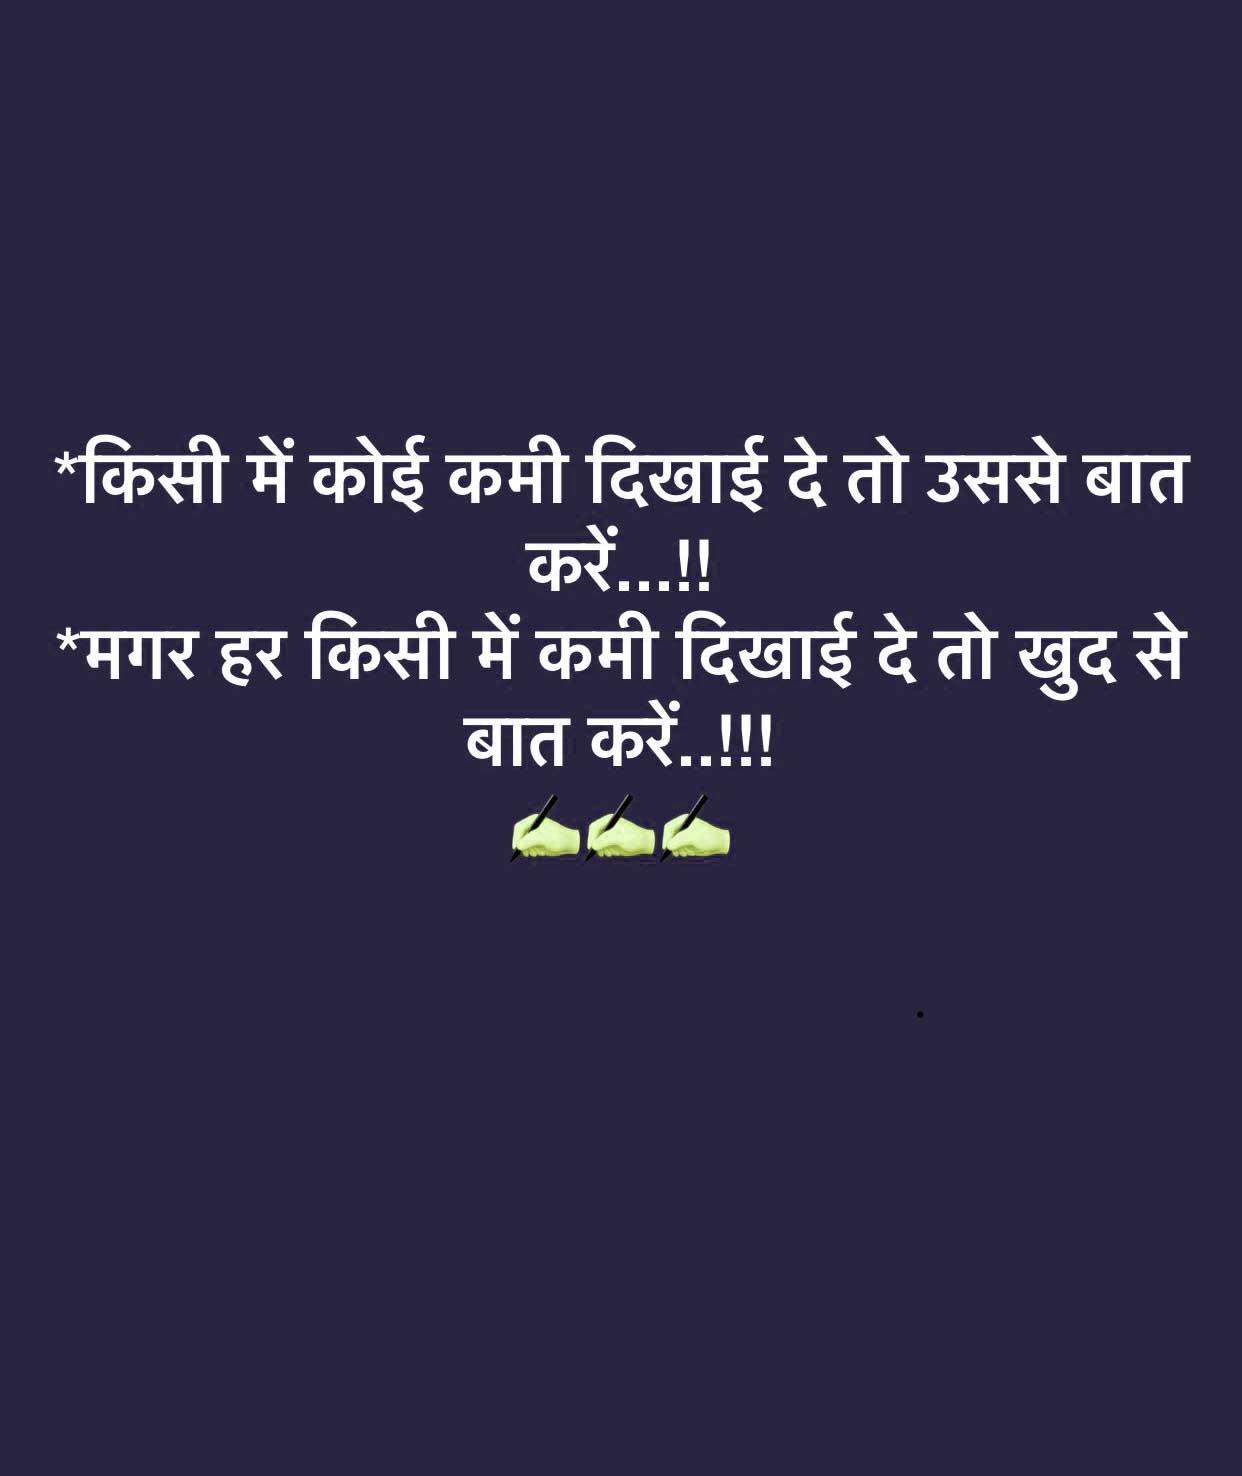 Hindi Love Whatsapp DP Free Images Hd